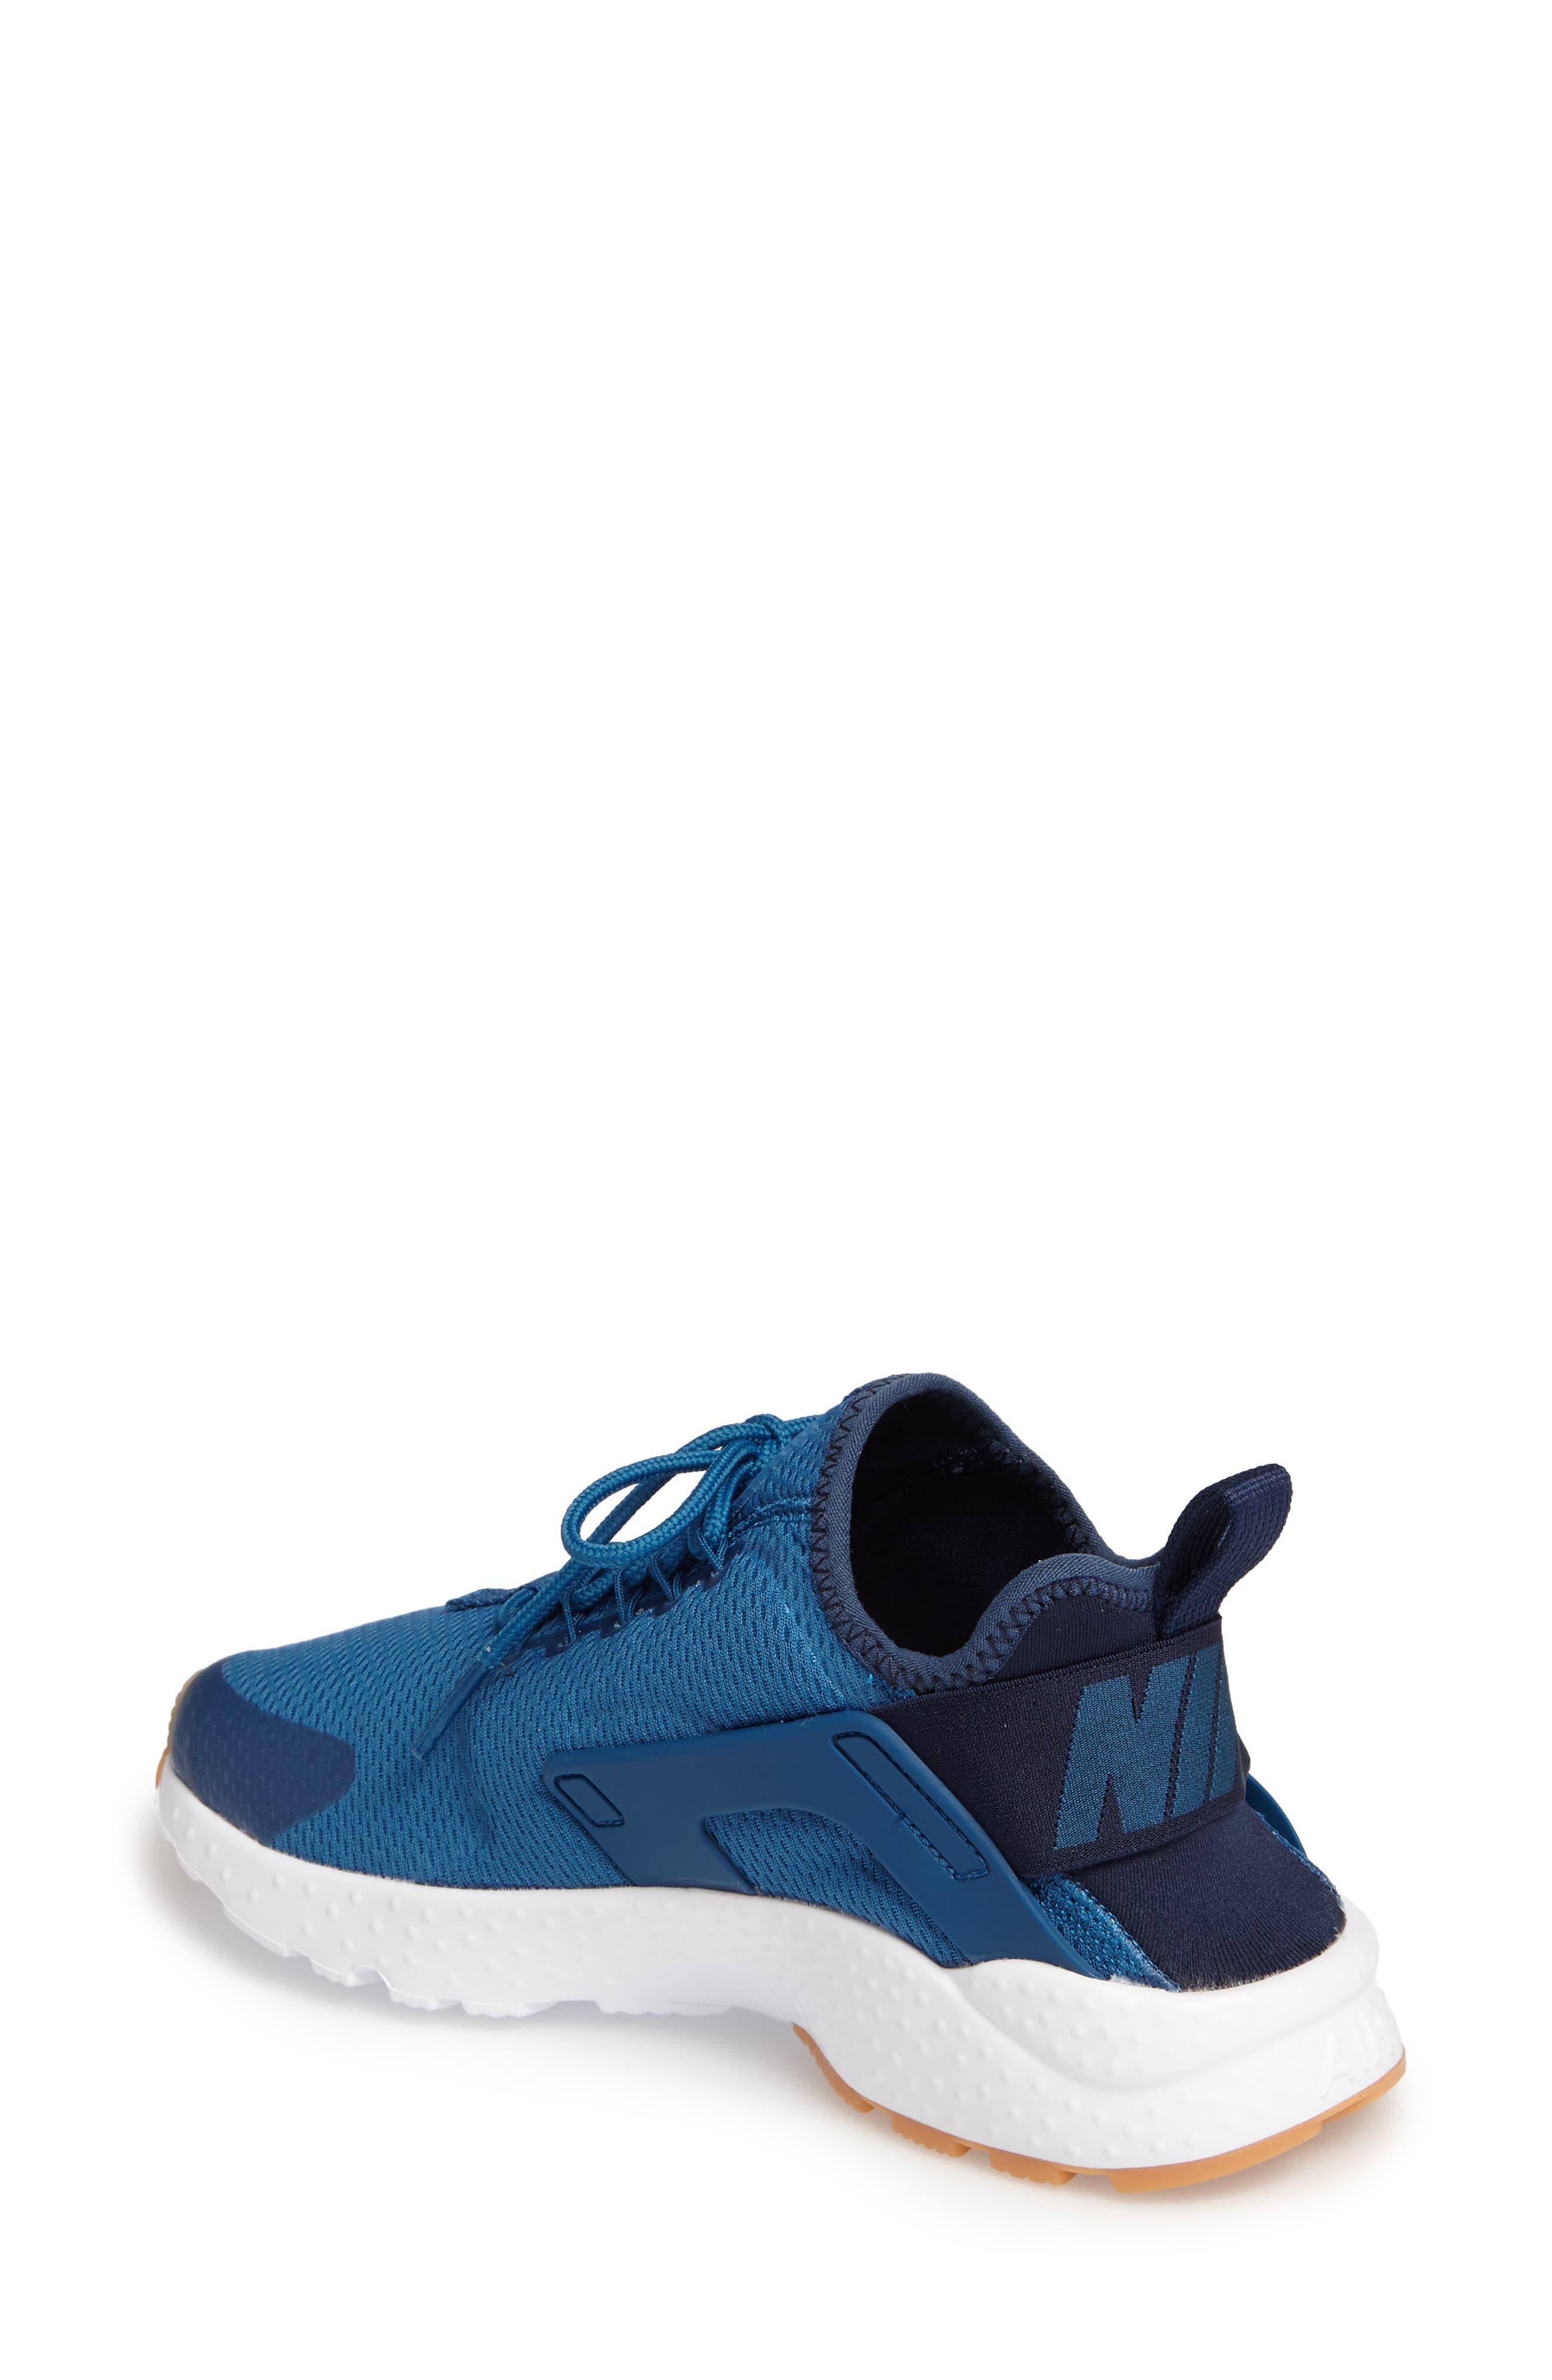 Air Huarache Sneaker,                             Alternate thumbnail 71, color,